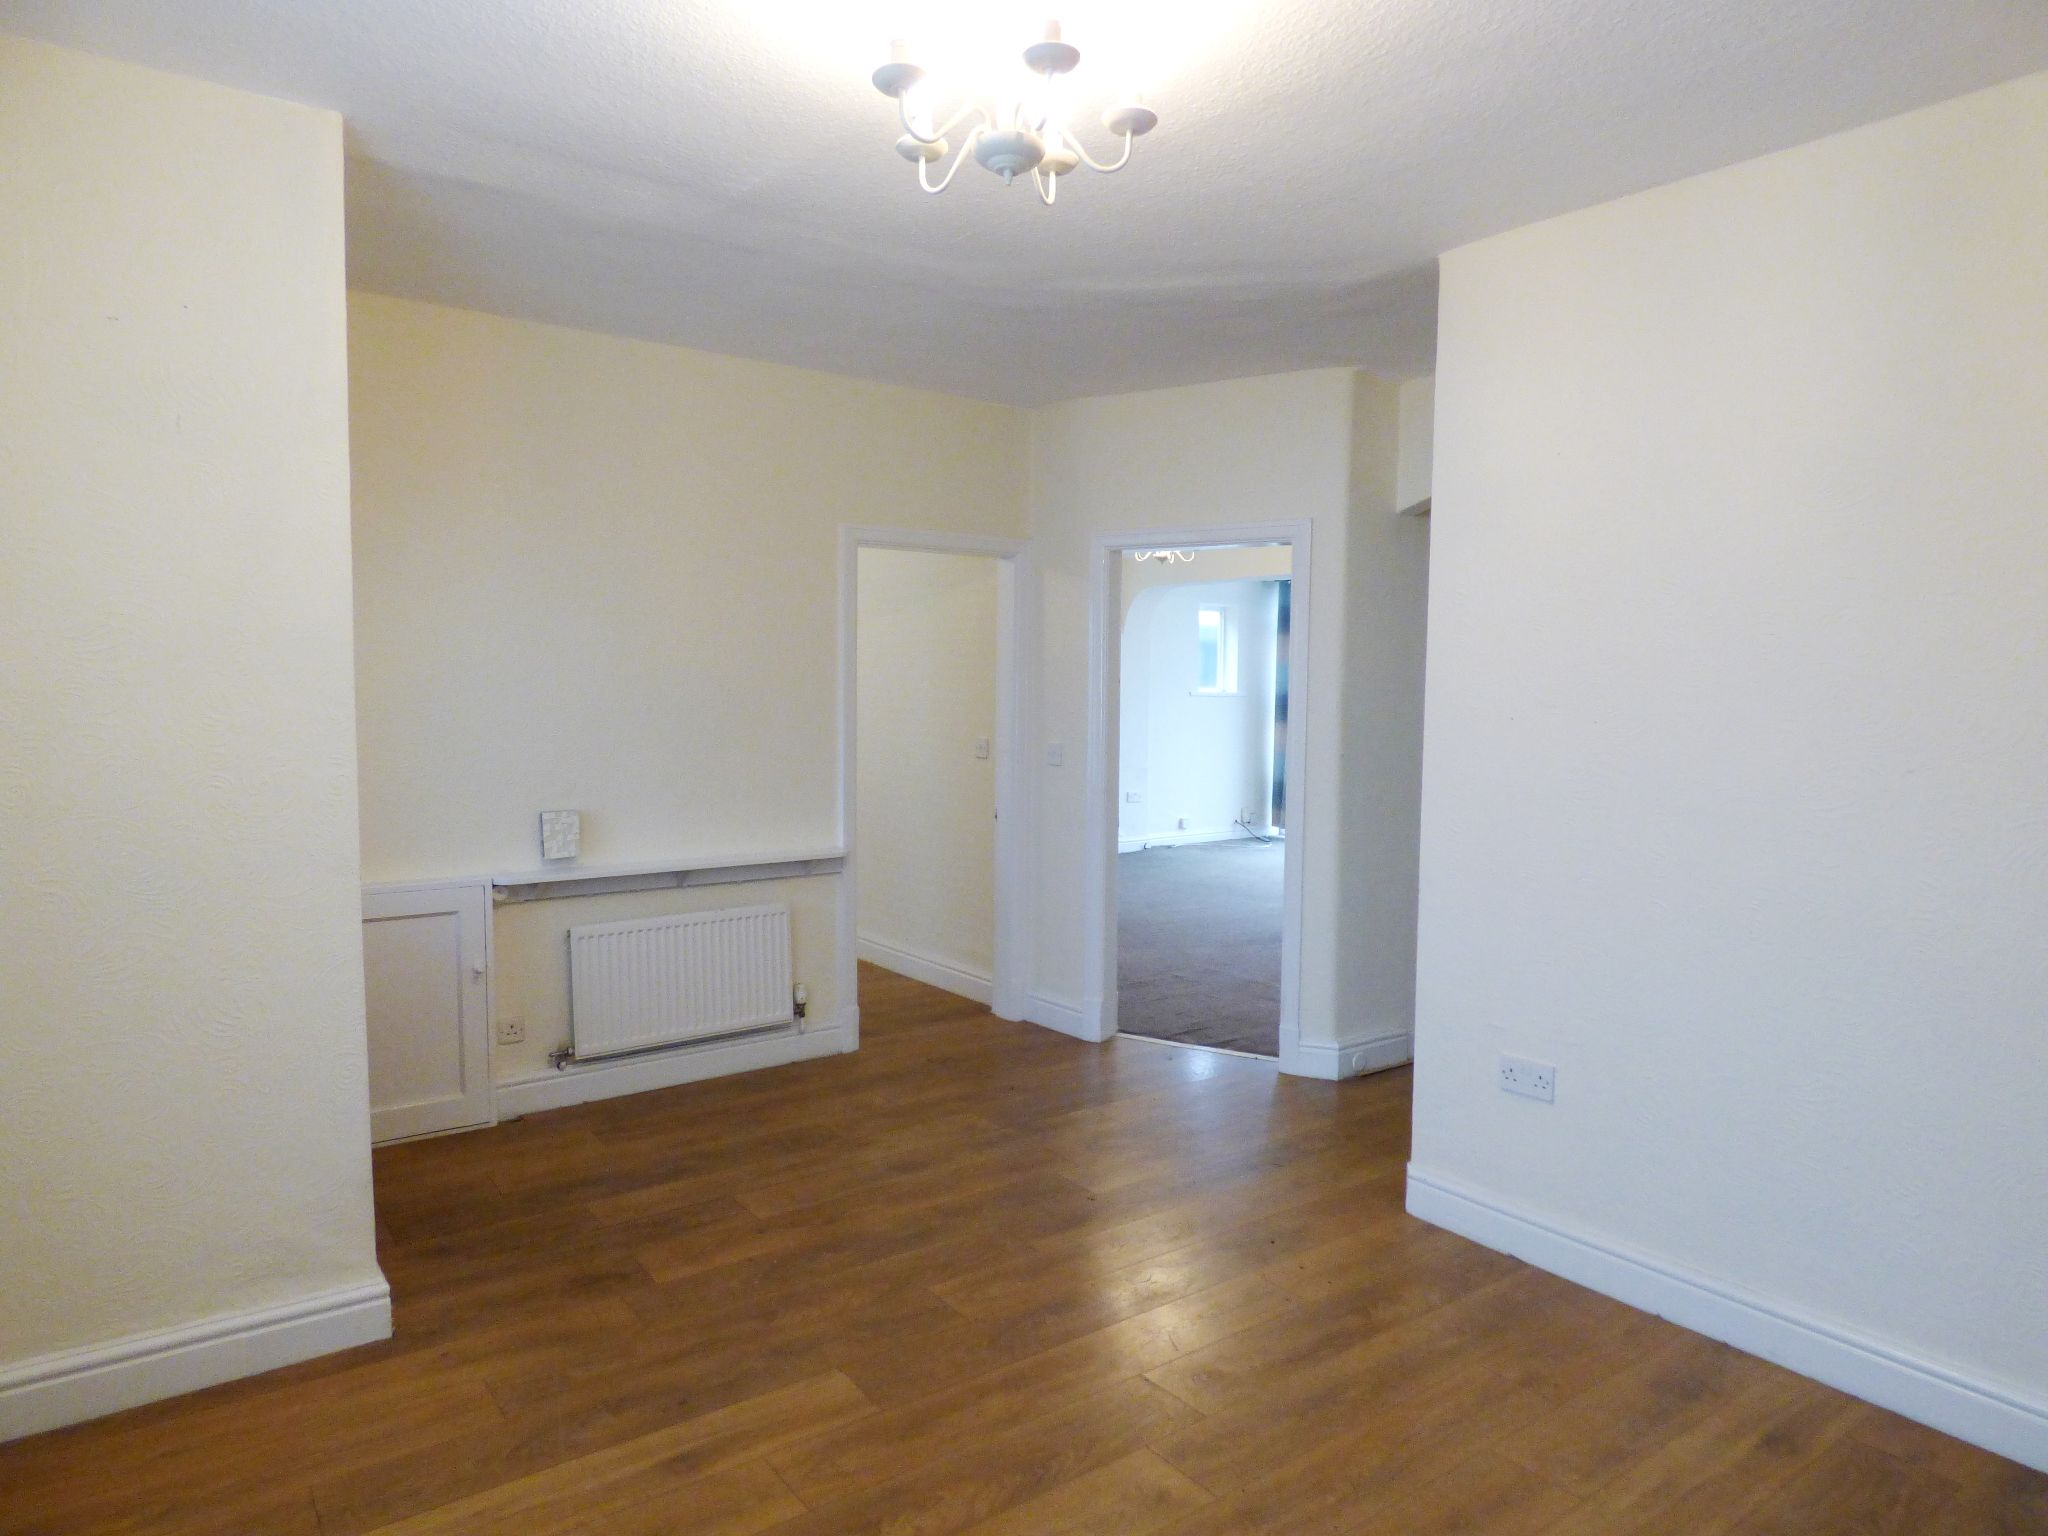 3 Bedroom Detached Bungalow For Sale - Reception Hall